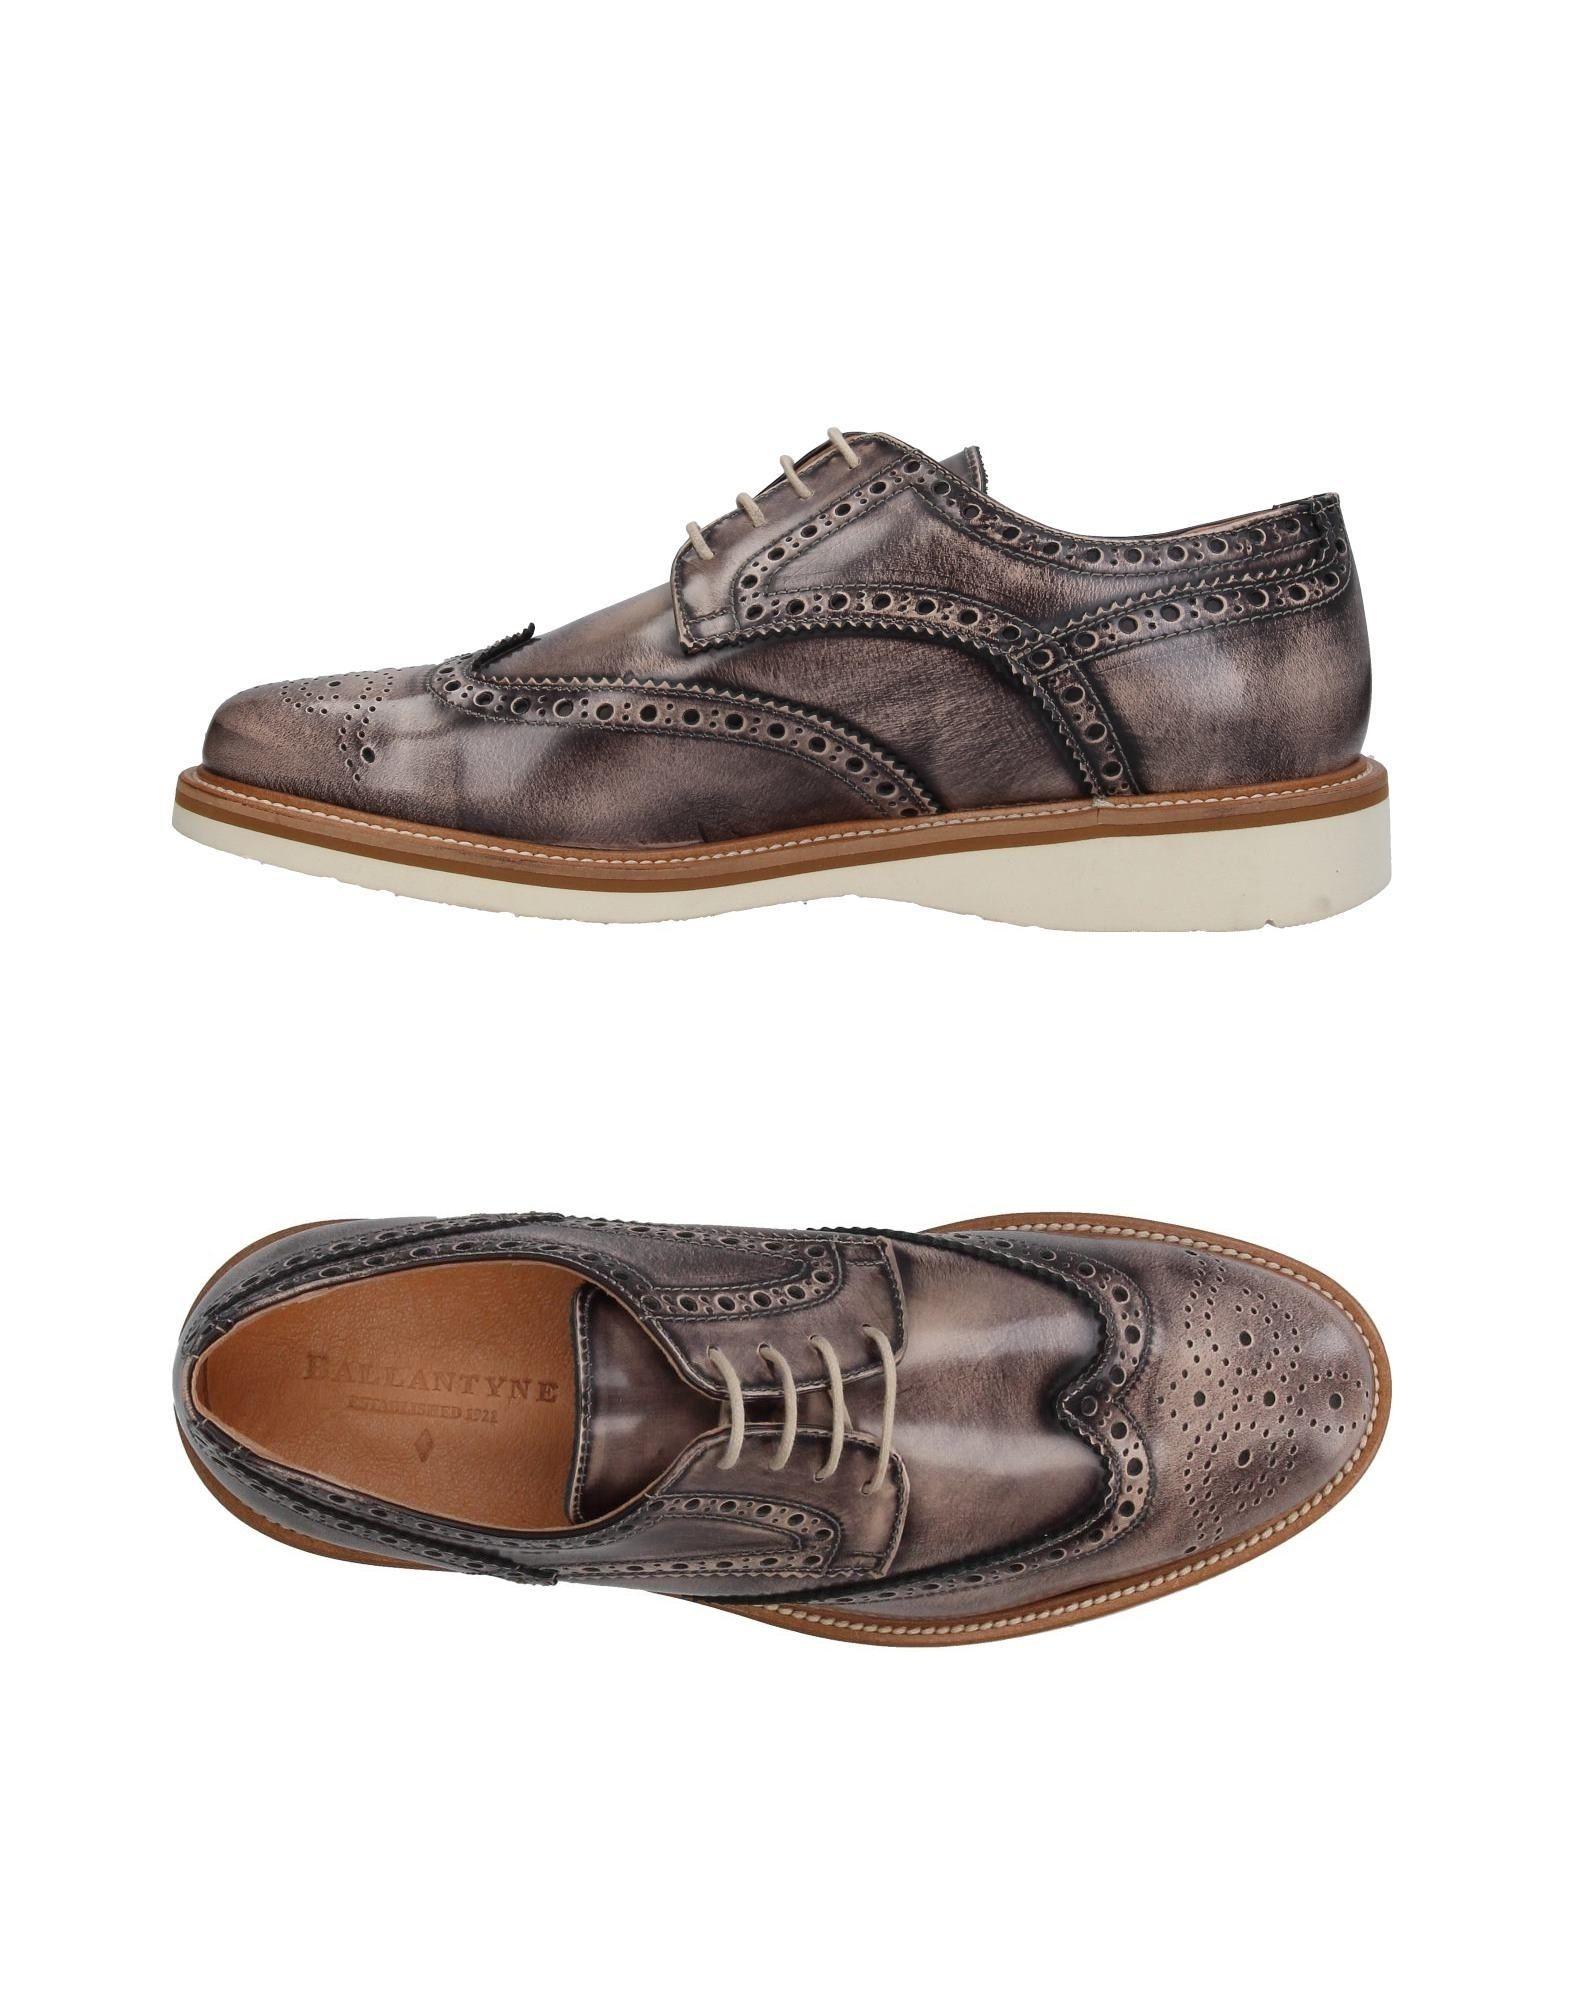 Rabatt echte Schuhe Ballantyne Schnürschuhe Herren  11379474RP